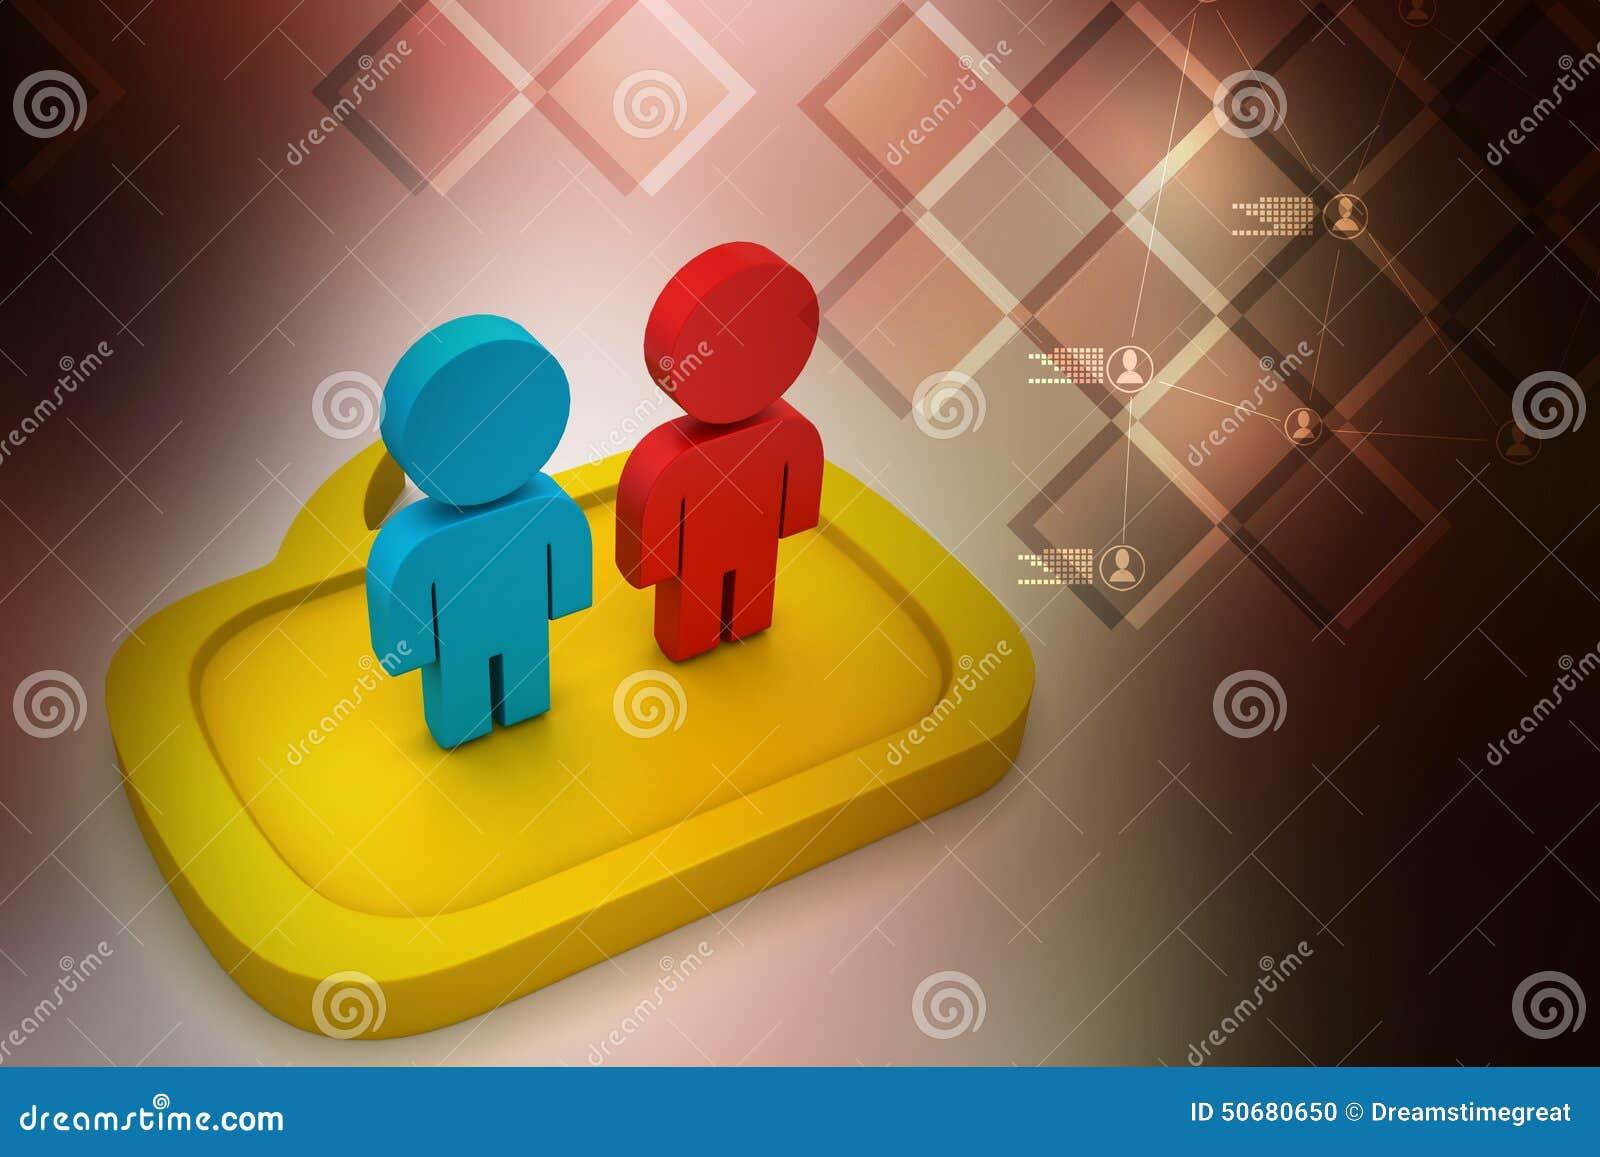 Download 站立在讲话泡影的商人 库存例证. 插画 包括有 办公室, bubblegum, 会议, 交易, 参与, 演奏台 - 50680650